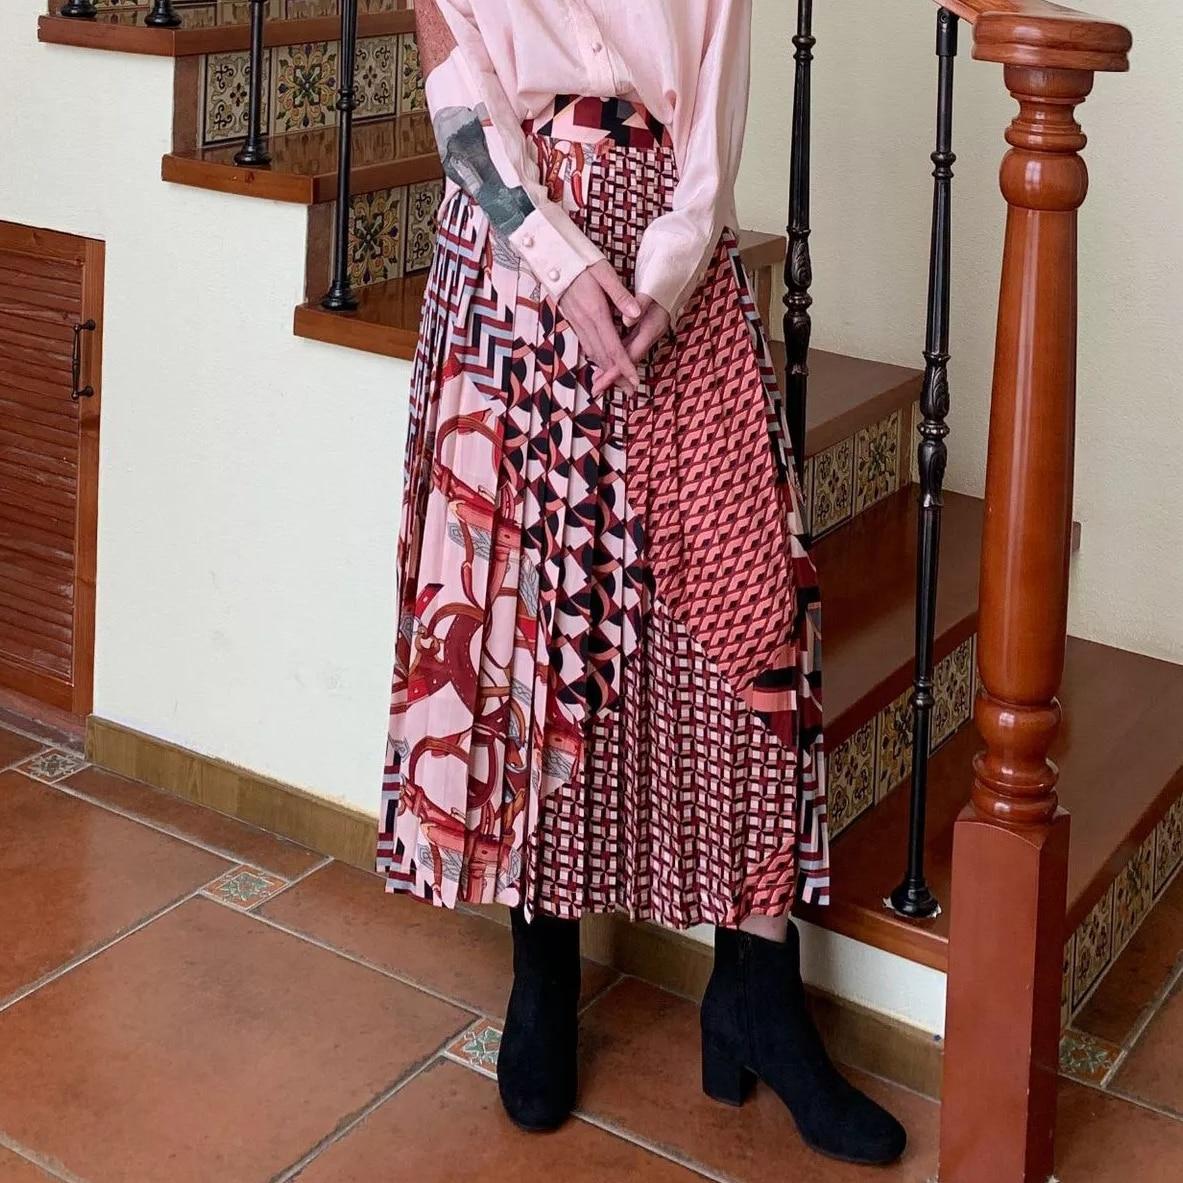 Vintage Chiffon Skirt Women High Waist Geometric Patterns Swing A line Midi Pleated Skirts Ladies High Street 2019 Autumn